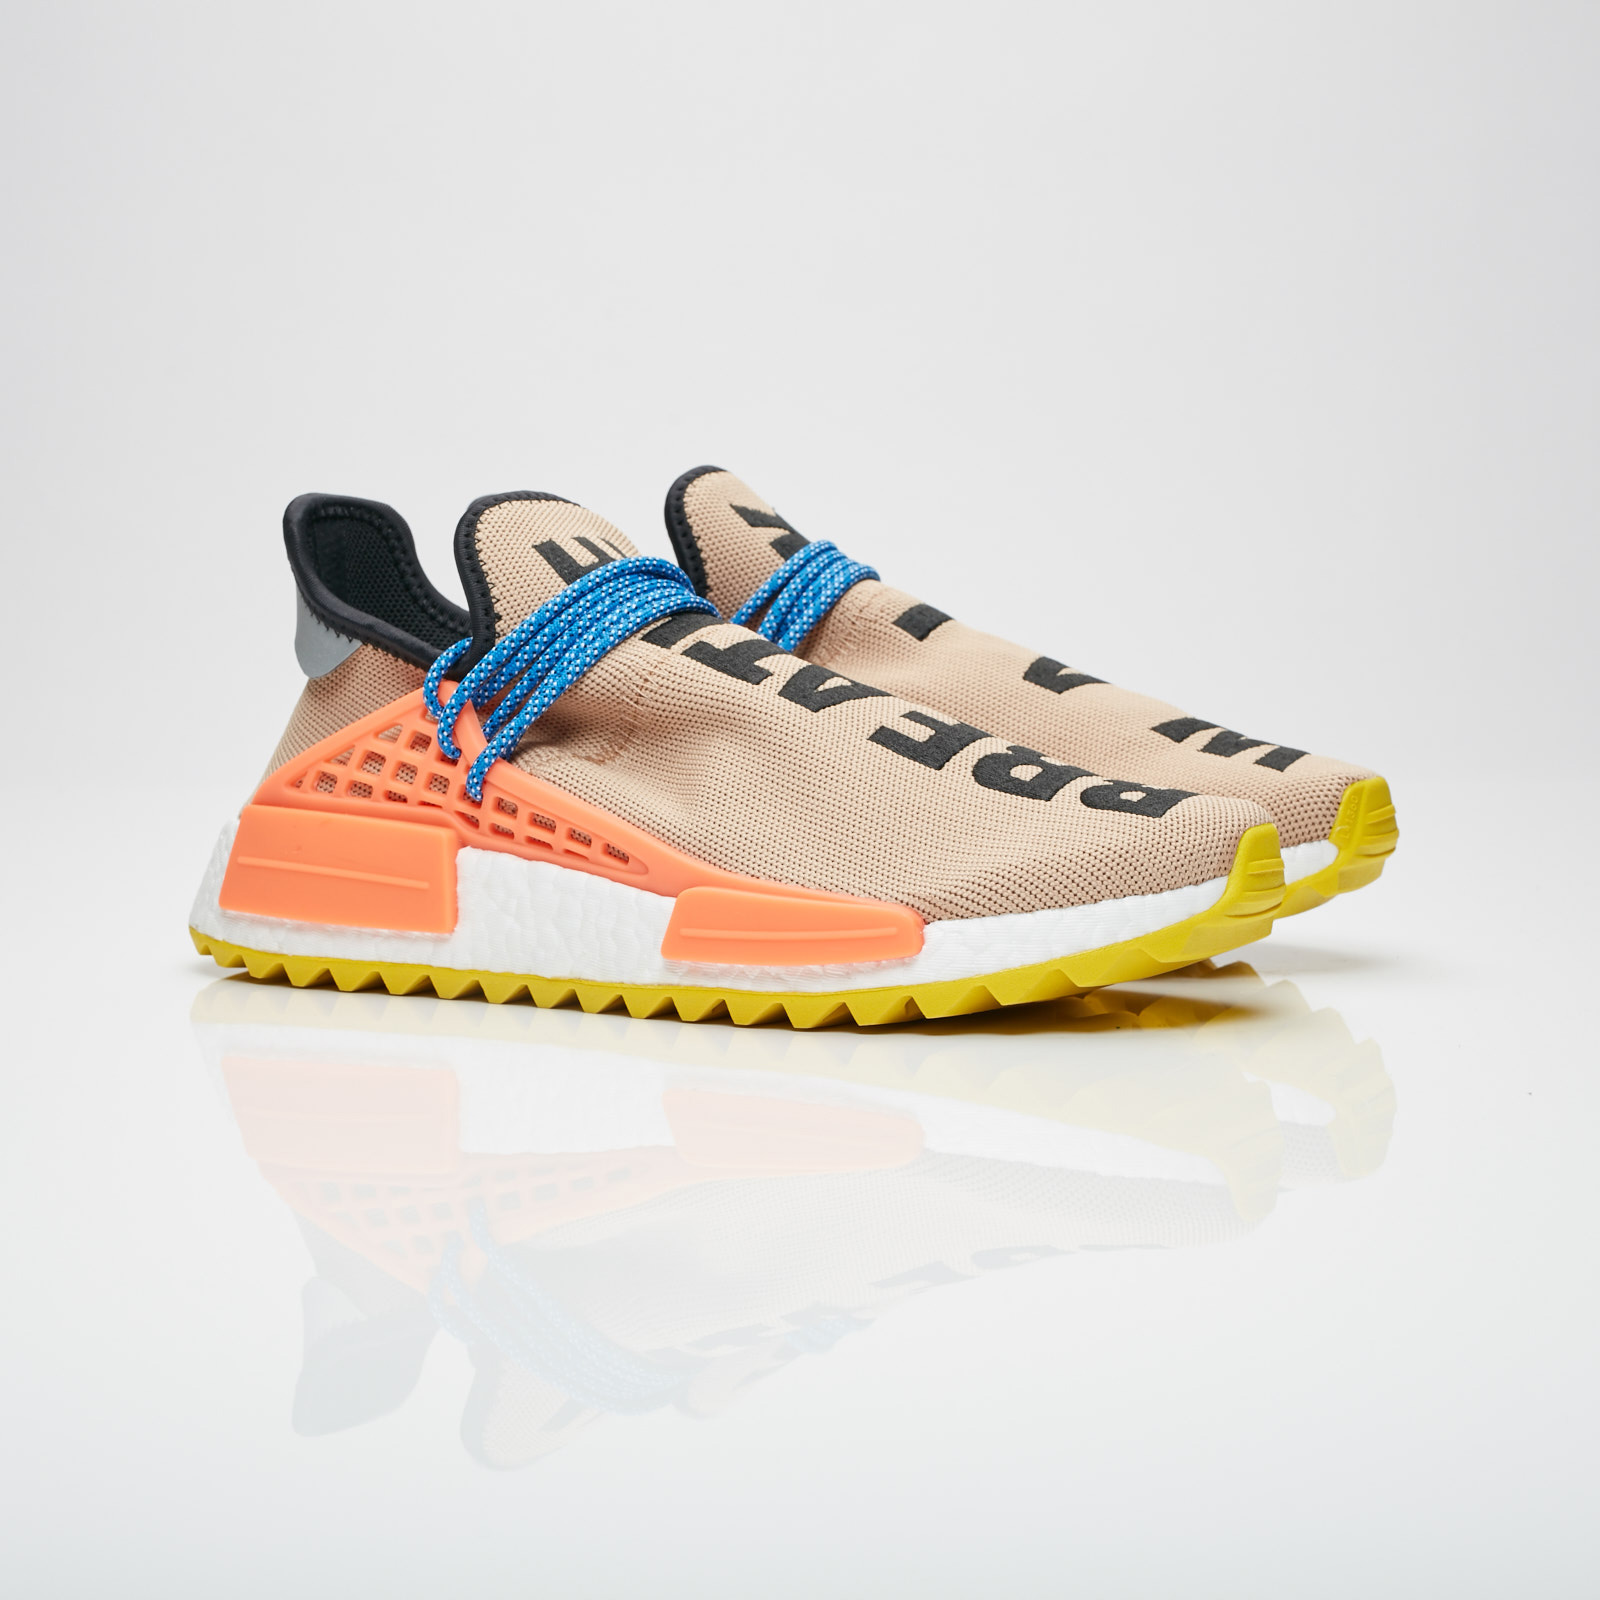 dc98e7160 adidas PW Human Race NMD T - Ac7361 - Sneakersnstuff